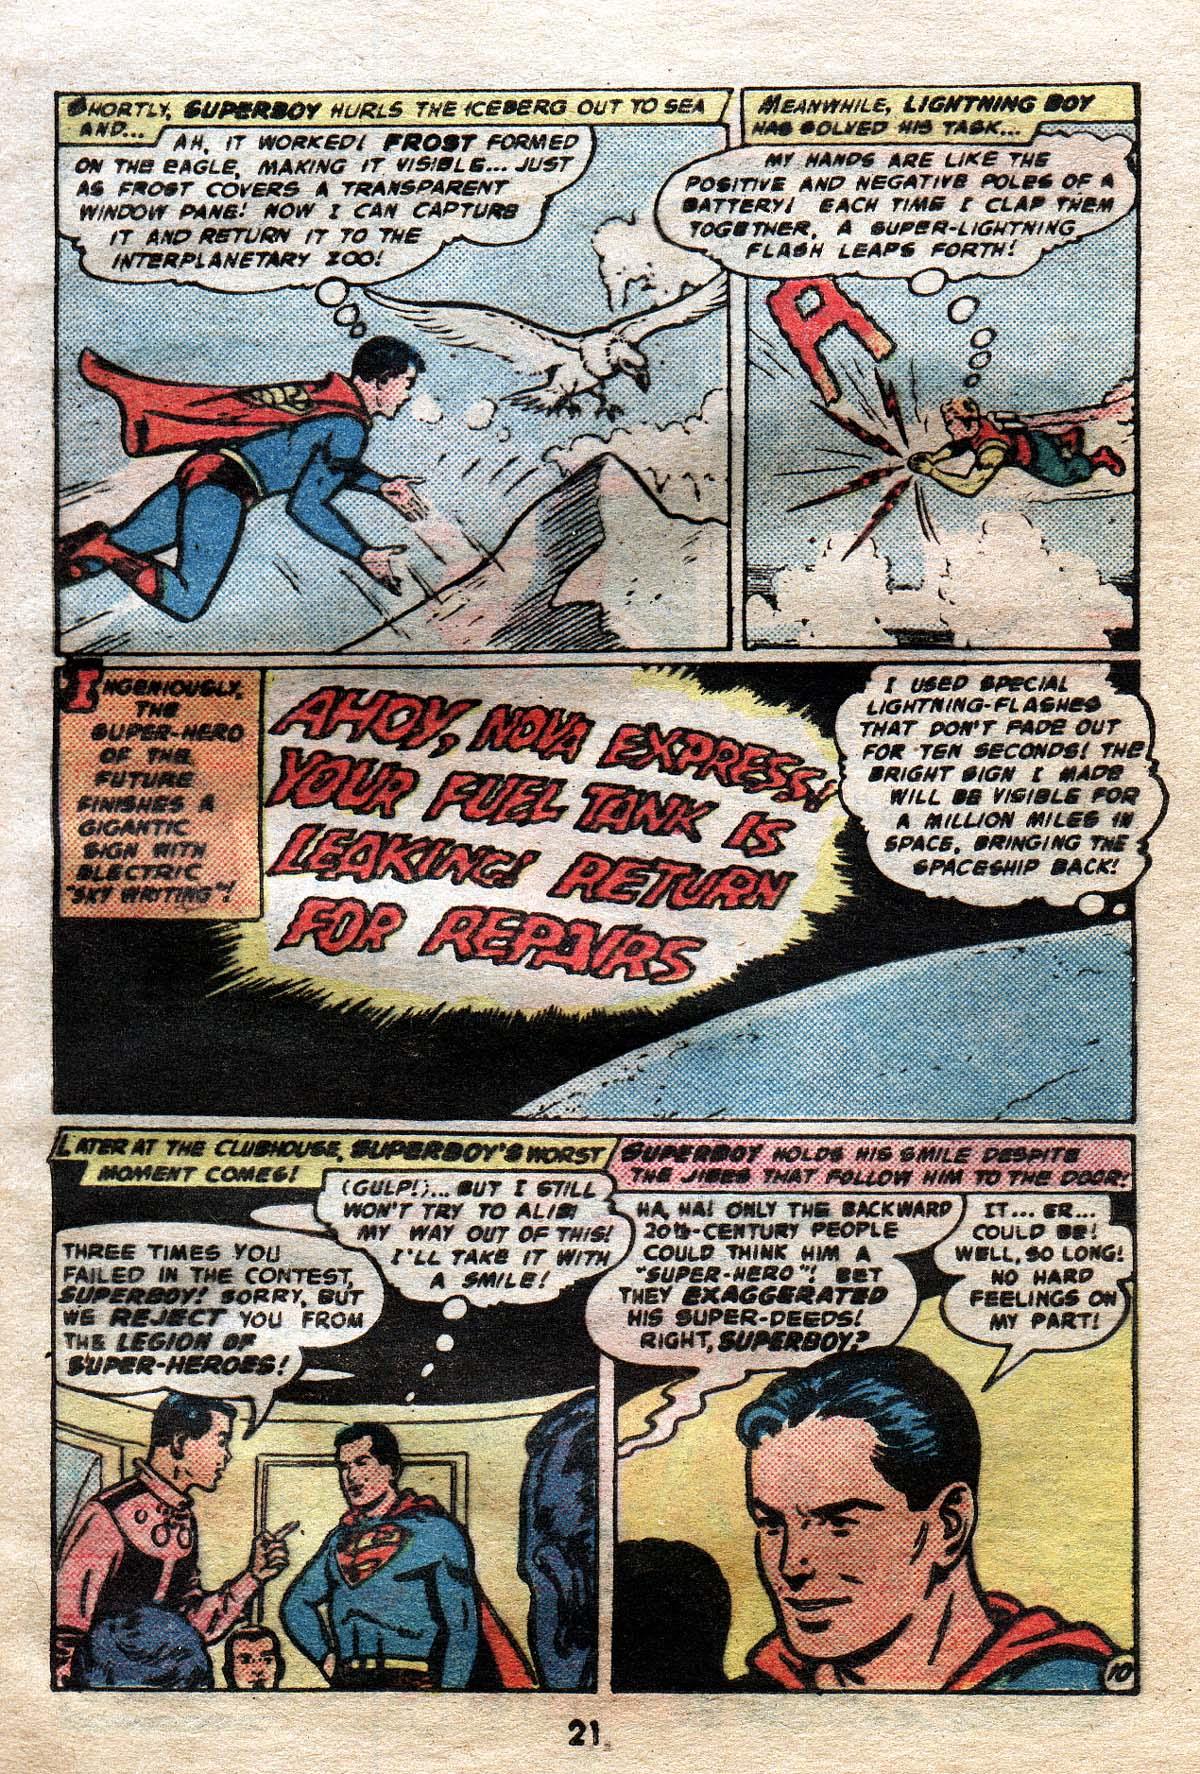 Read online Adventure Comics (1938) comic -  Issue #491 - 21